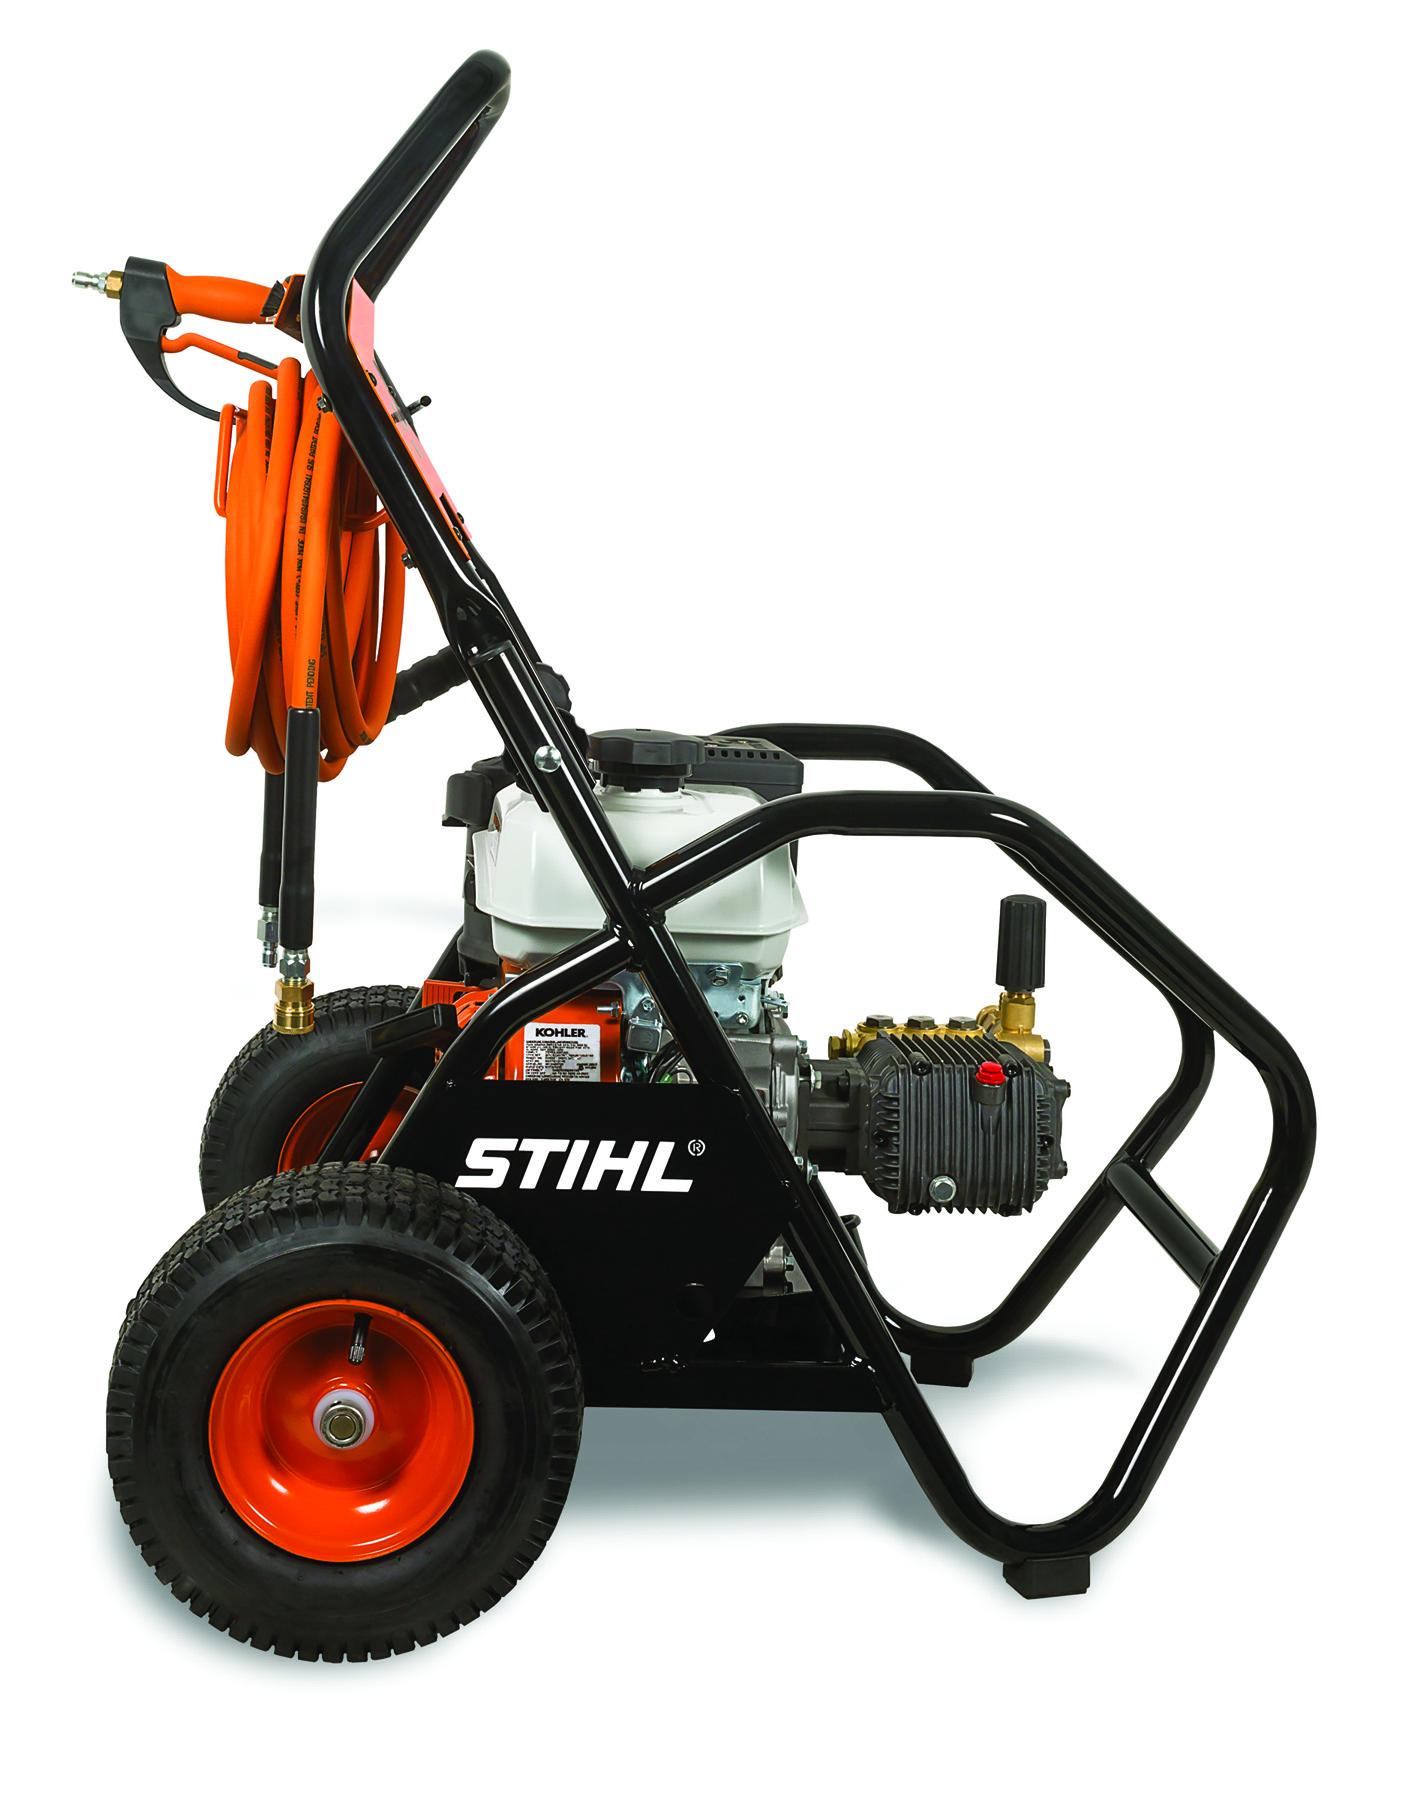 STIHL RB 600 Action Image